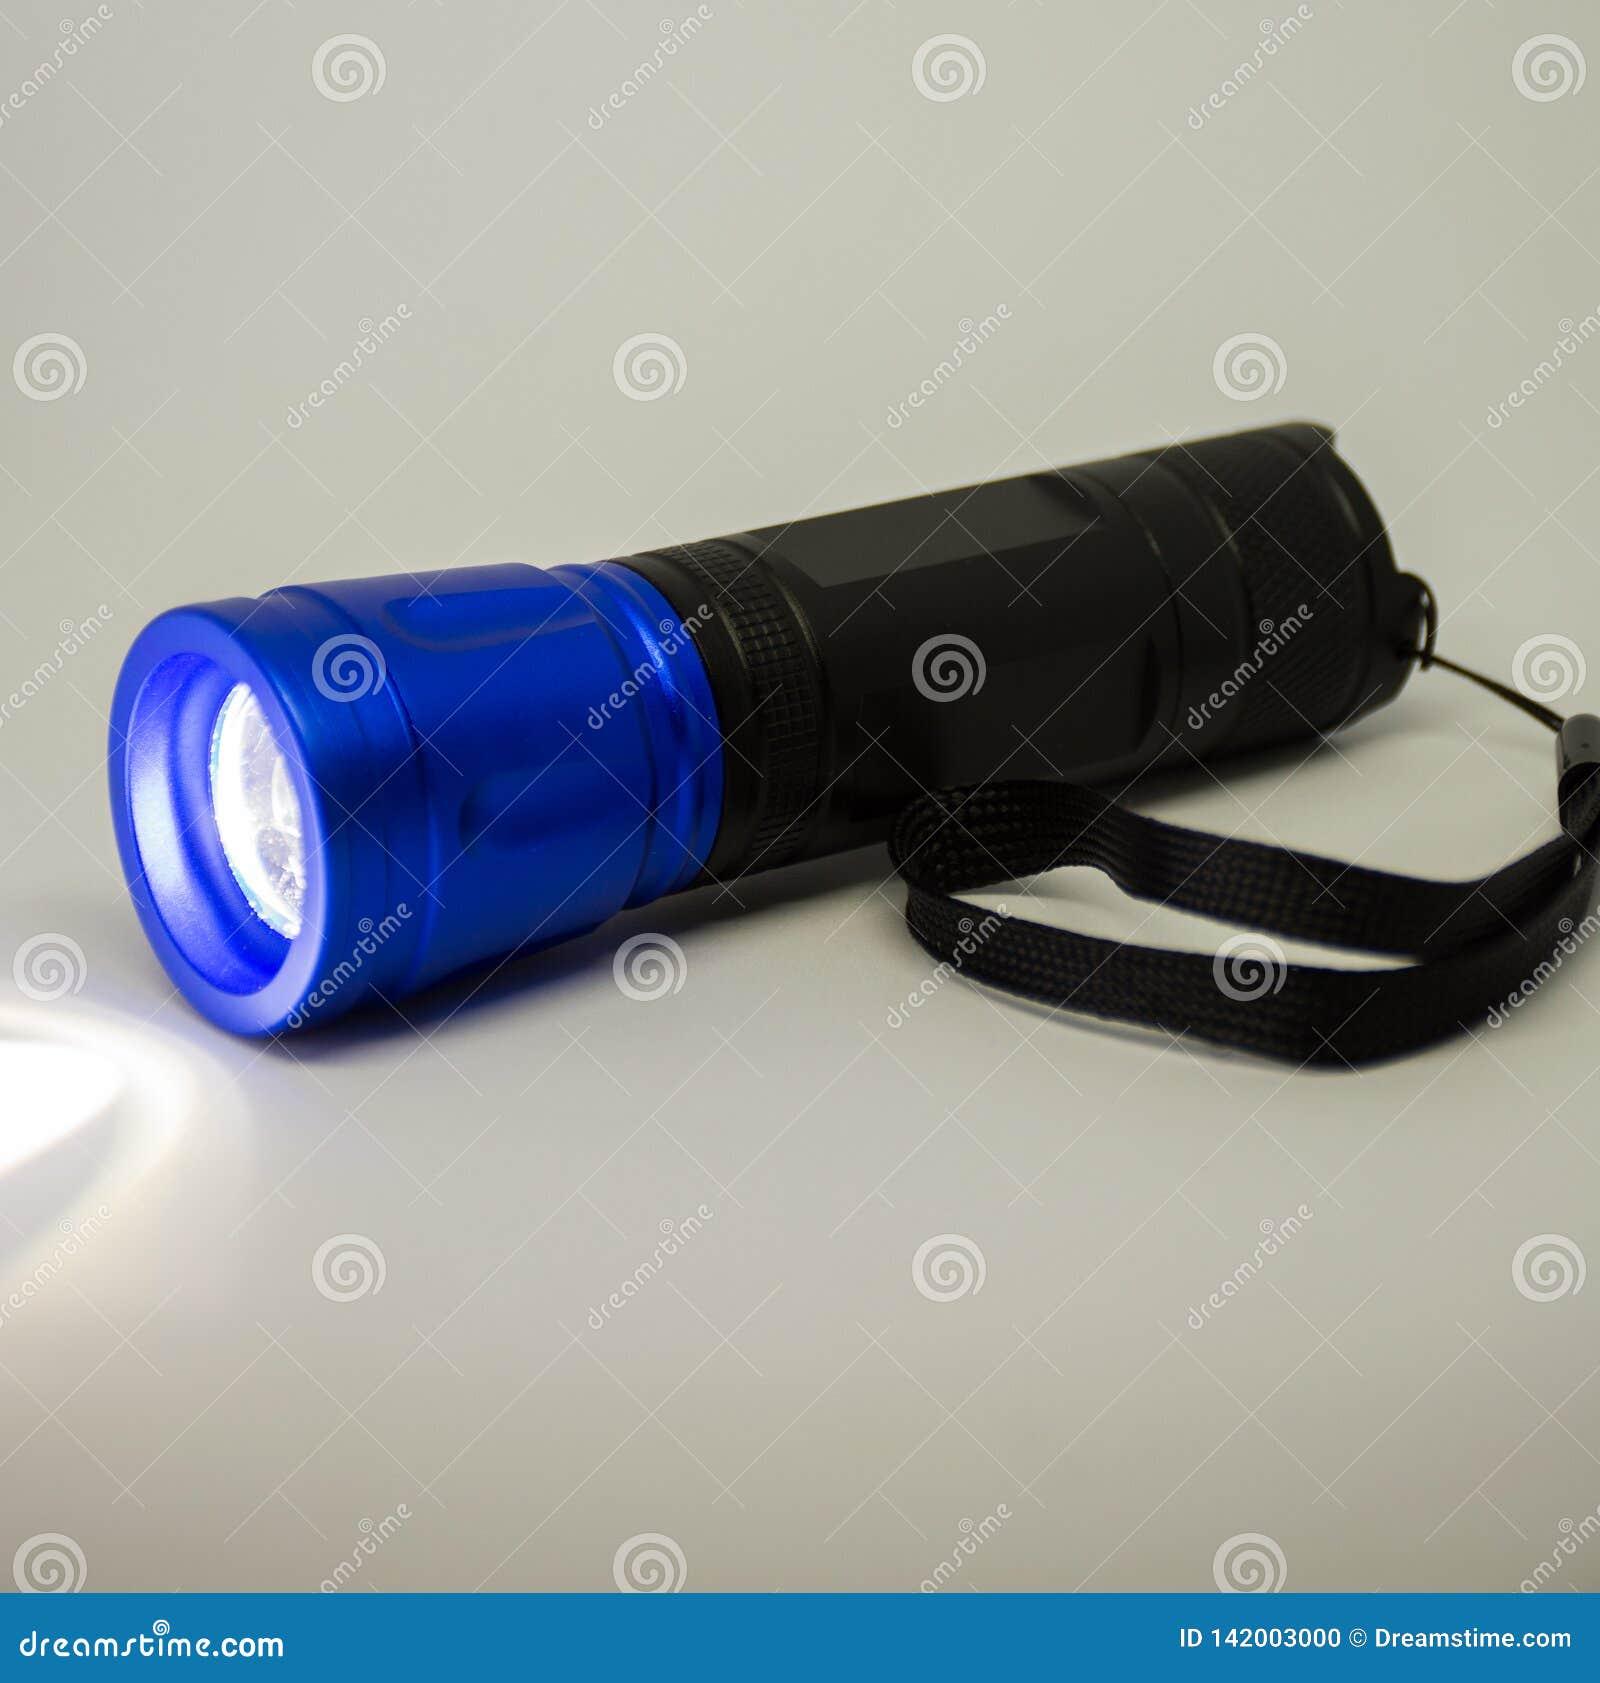 Torcia elettrica o torcia portatile